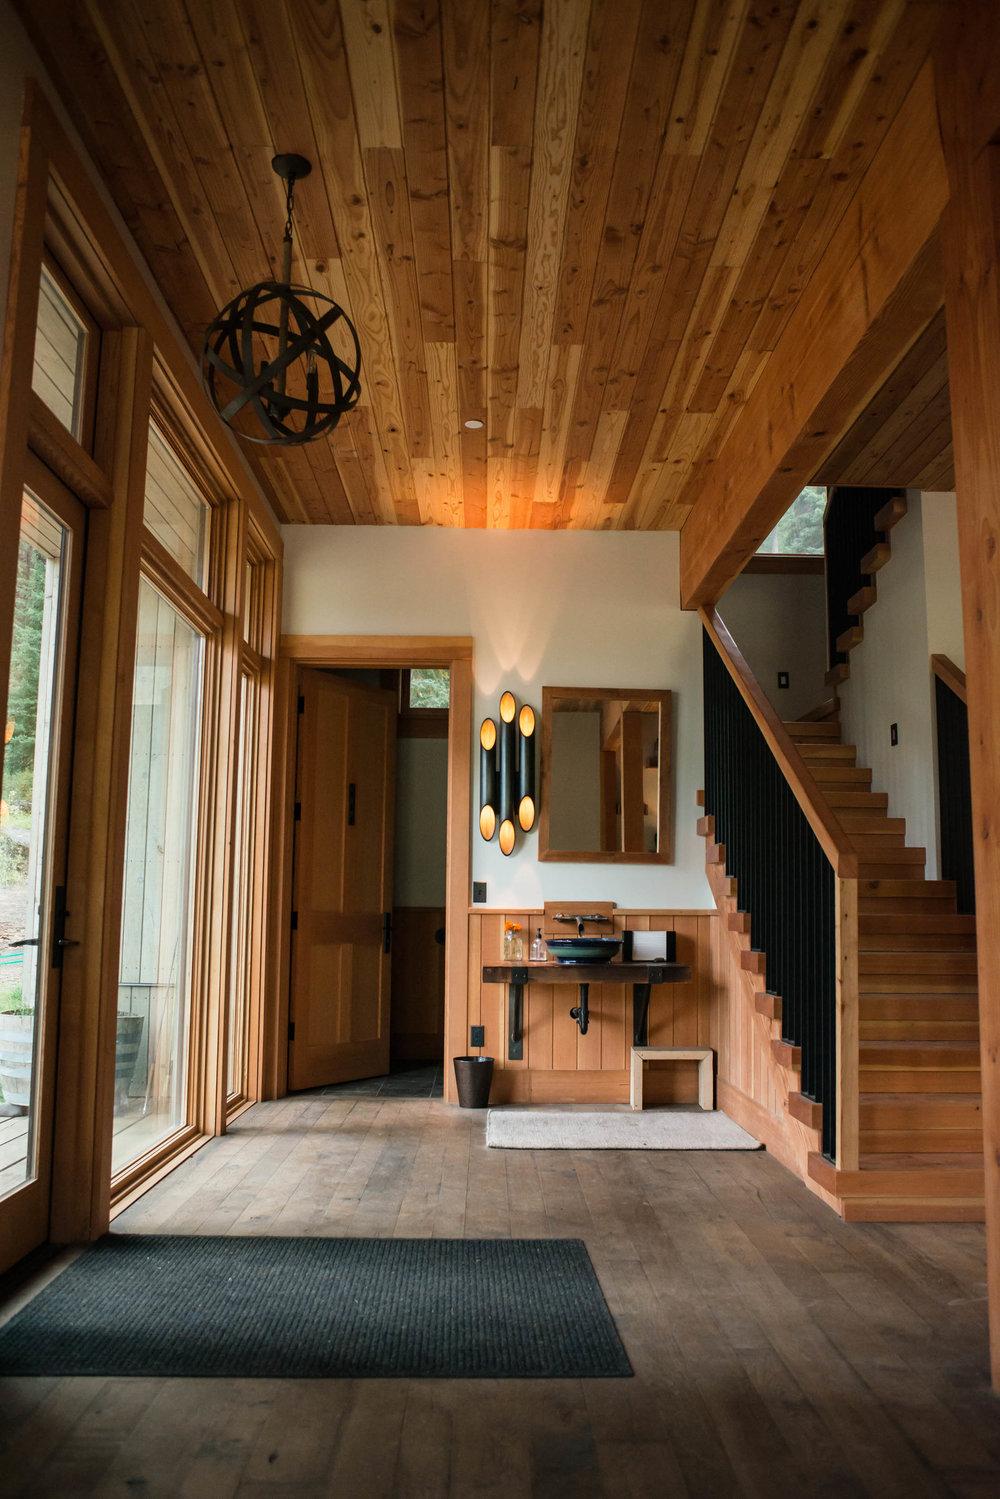 Minam_River_Lodge_Wallowa_Mountains_Eagle_Cap_Wilderness_Oregon_Autumn_2017_Please_Credit_Talia_Jean_Galvin-148.jpg